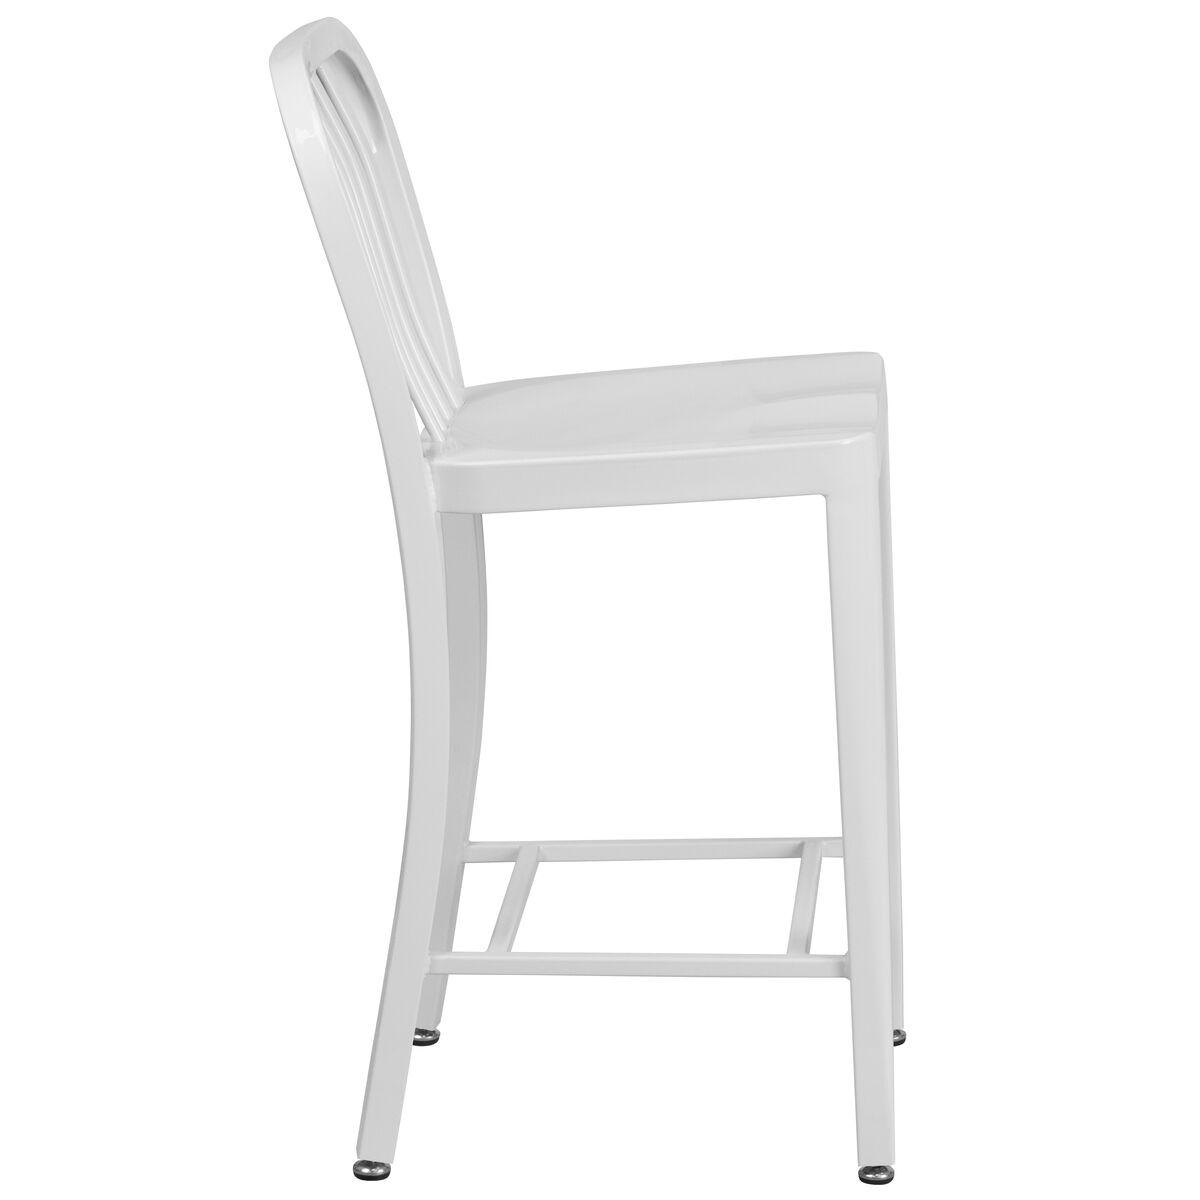 24 High White Metal Indoor Outdoor Counter Height Stool